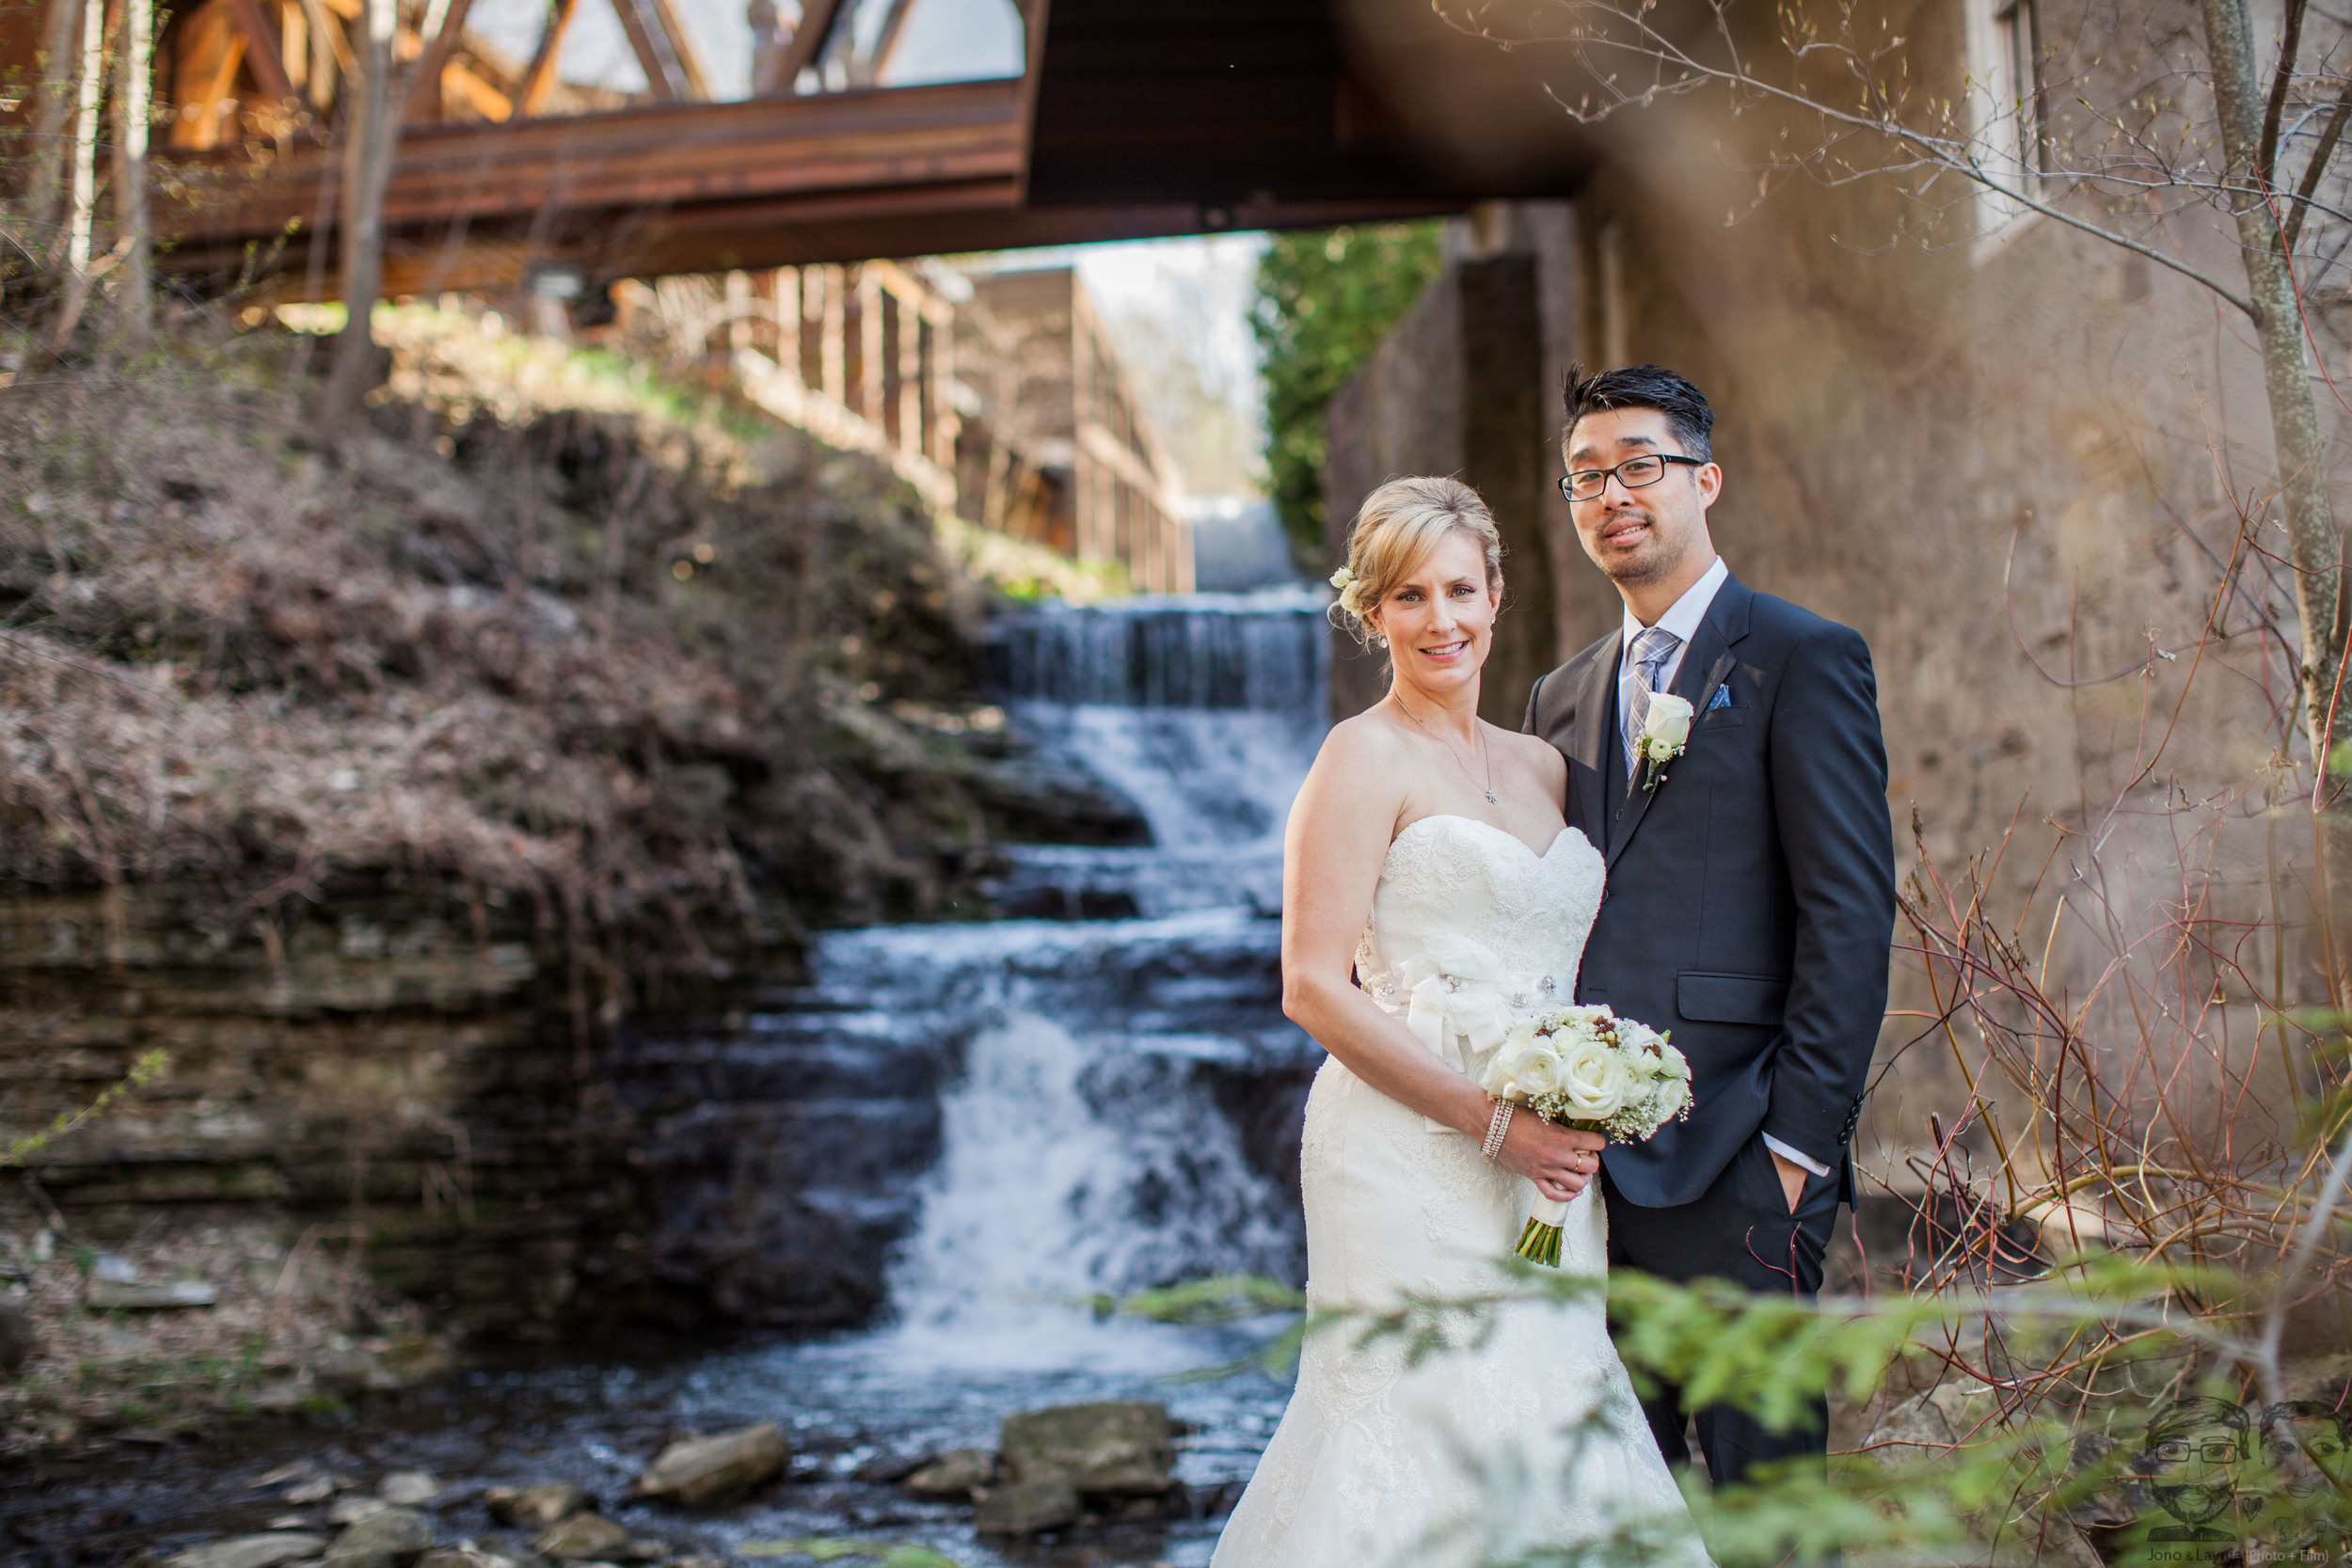 047Ancaster Mill-Toronto Photographers-Jono & Laynie Co.jpg